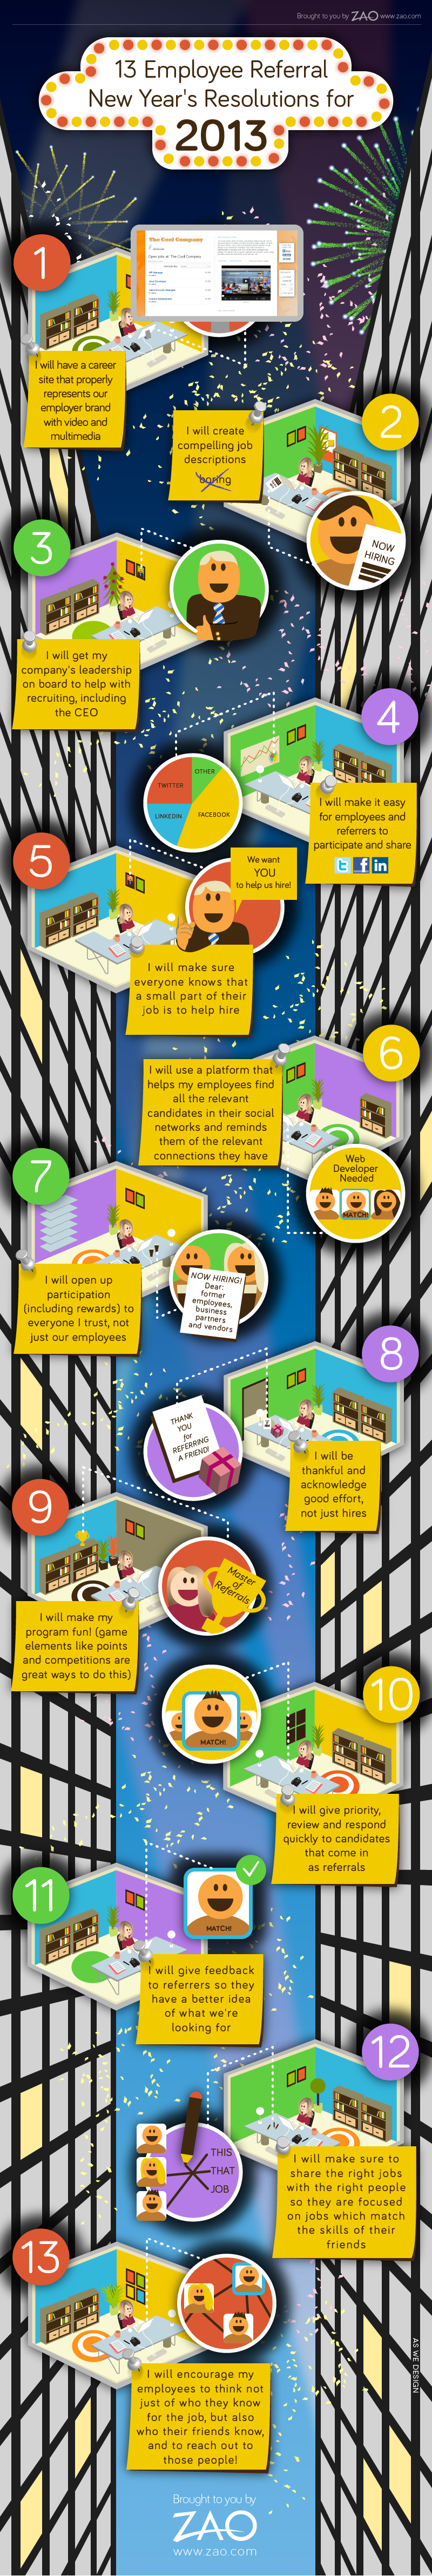 http://cdn2.business2community.com/wp-content/uploads/2013/01/resolutions_infographics_02-01.png